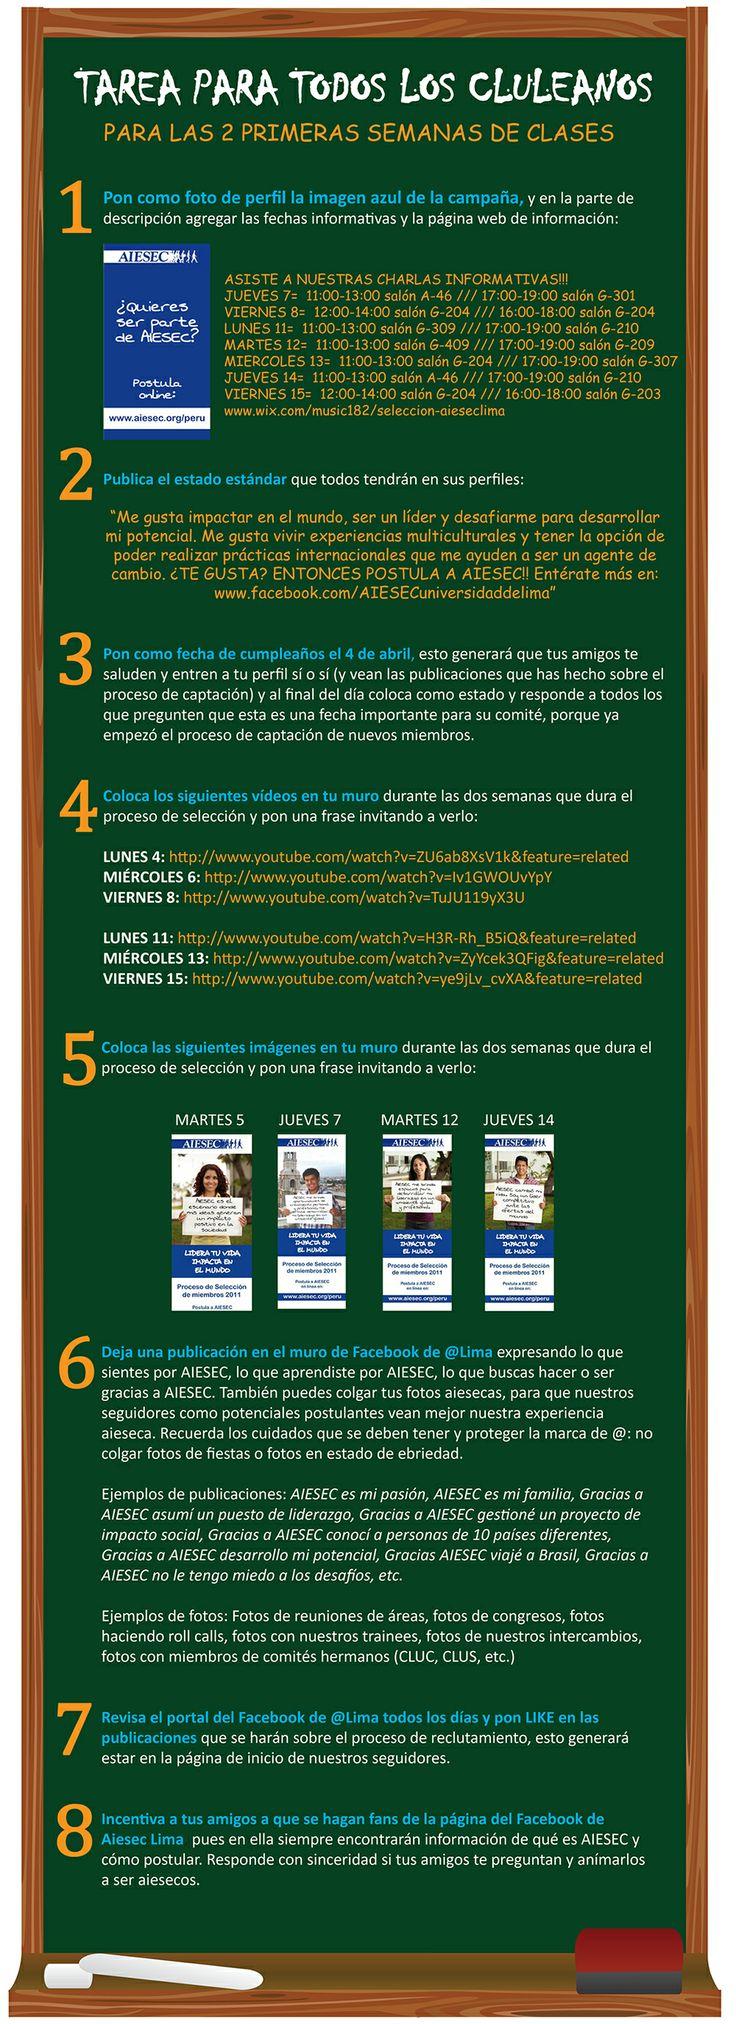 estrategia de difusión Captación 2011